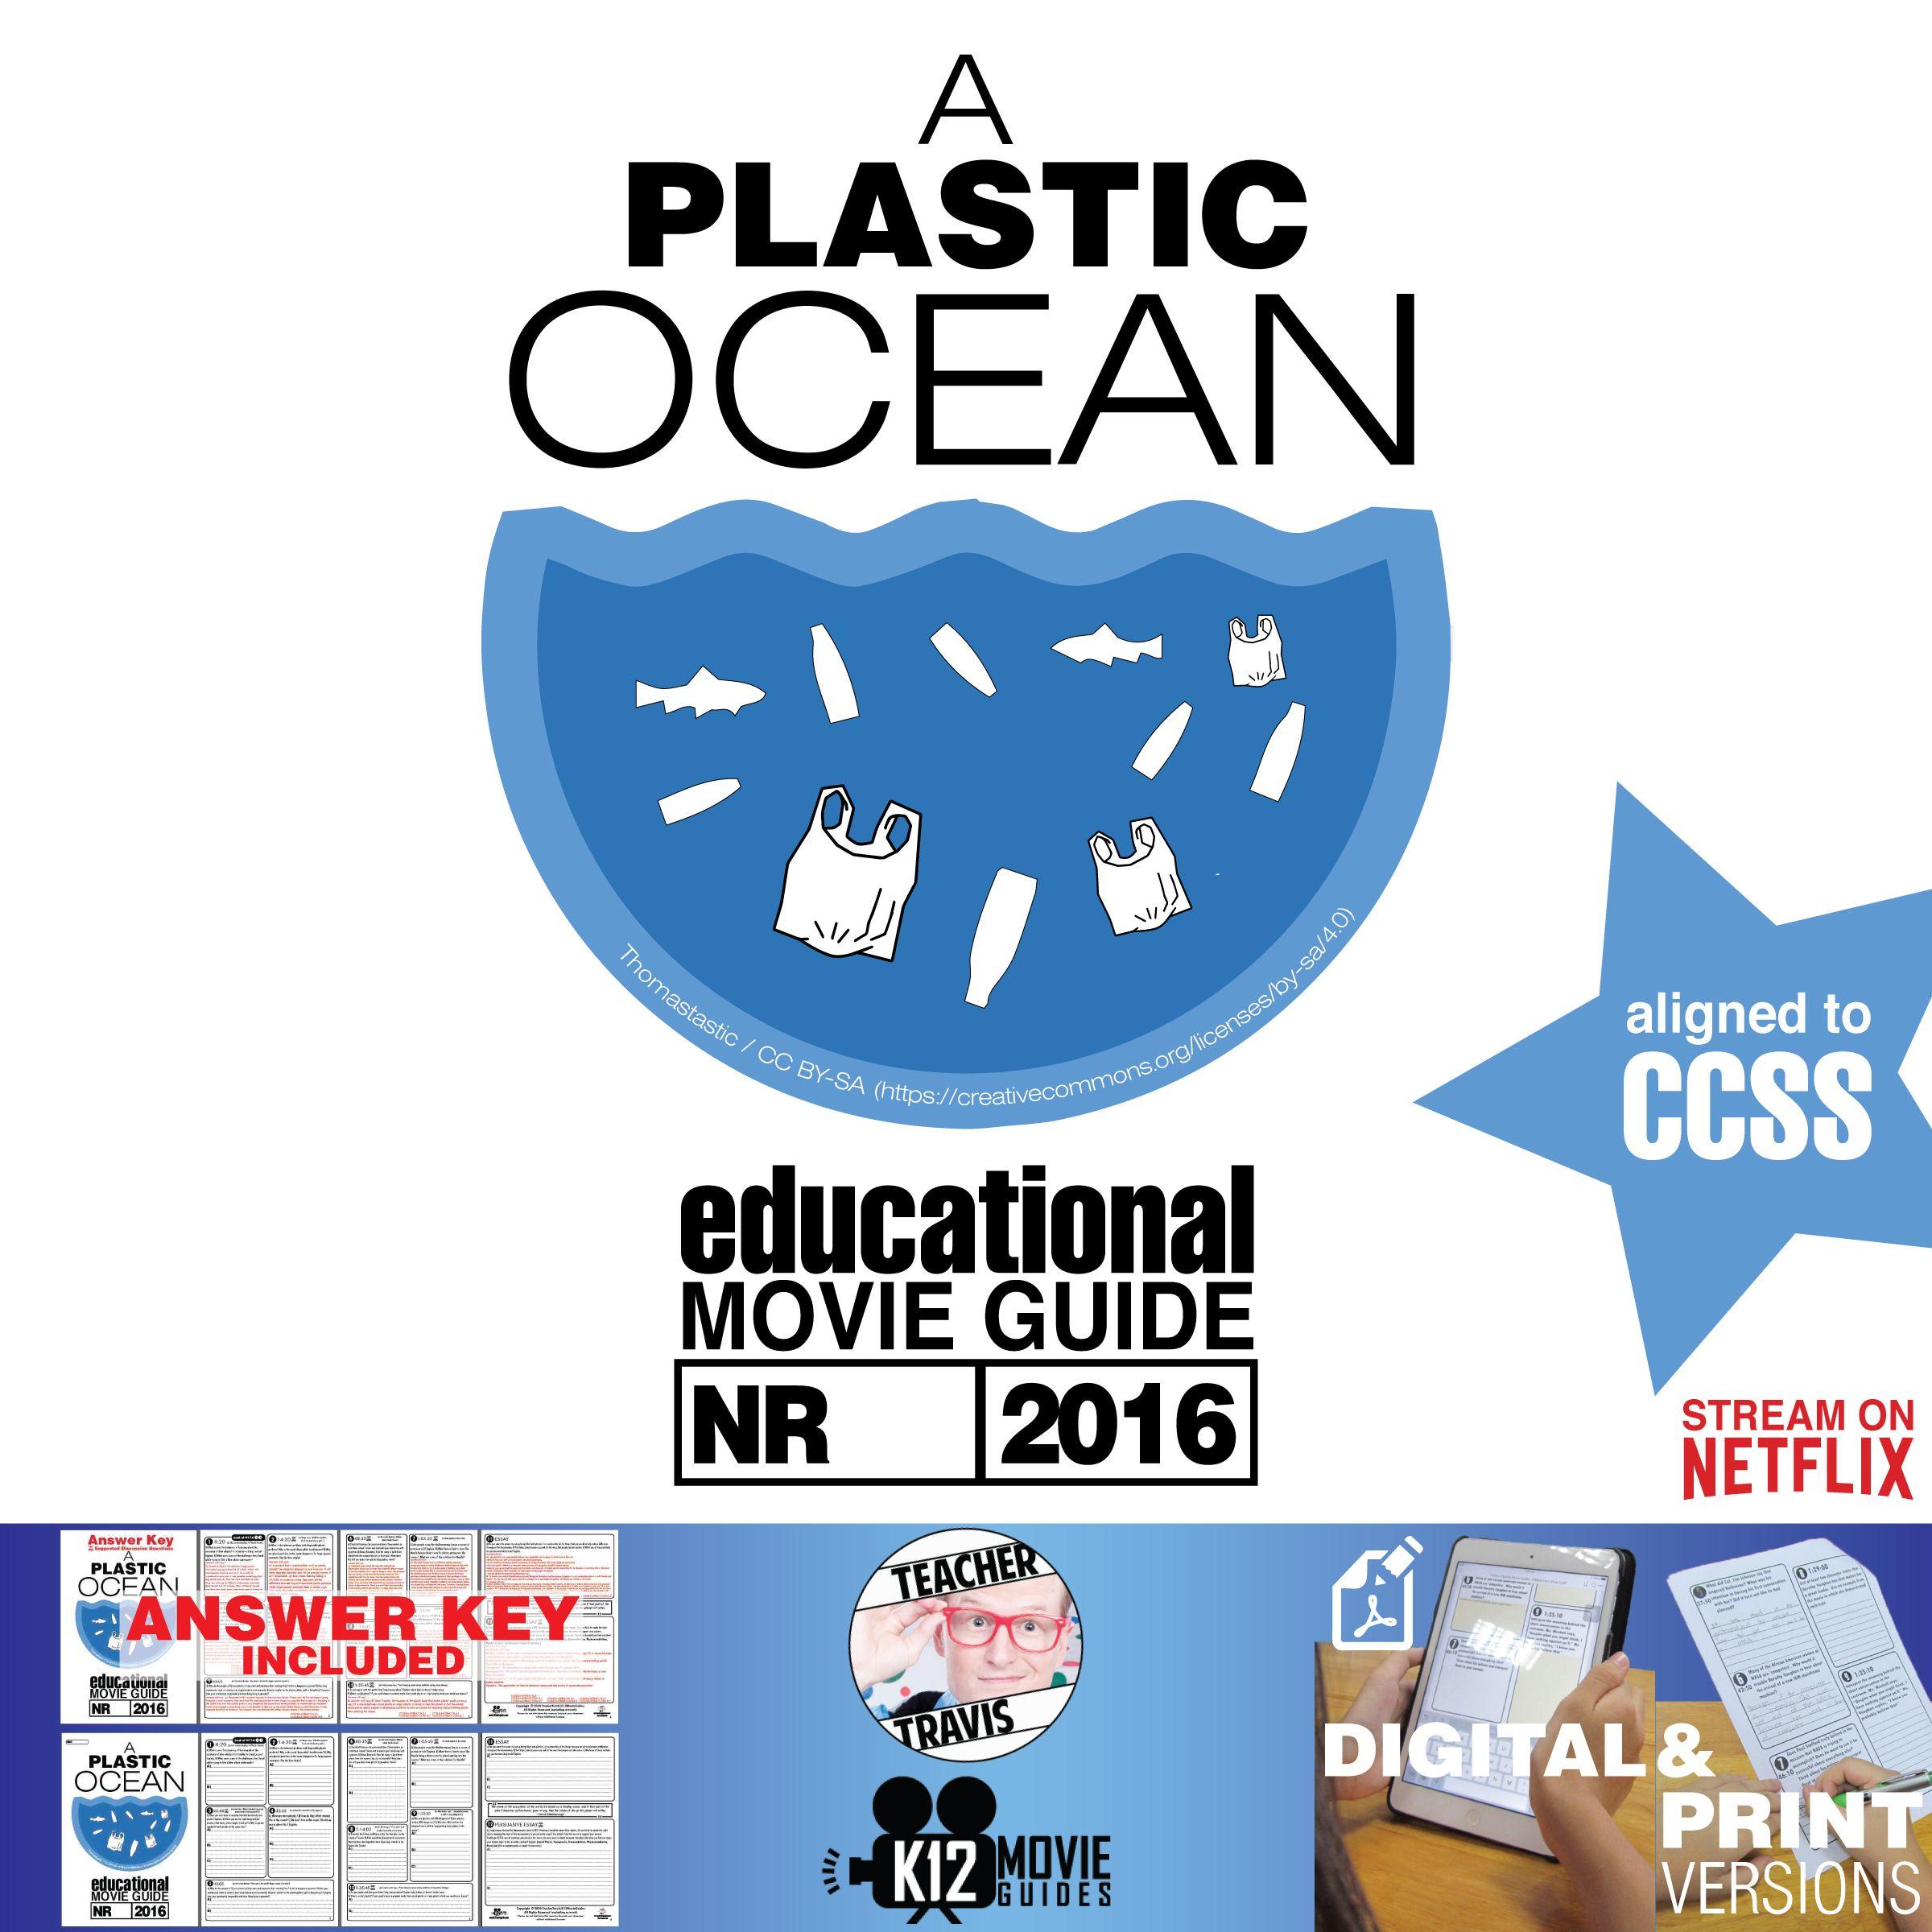 A Plastic Ocean Documentary Movie Guide